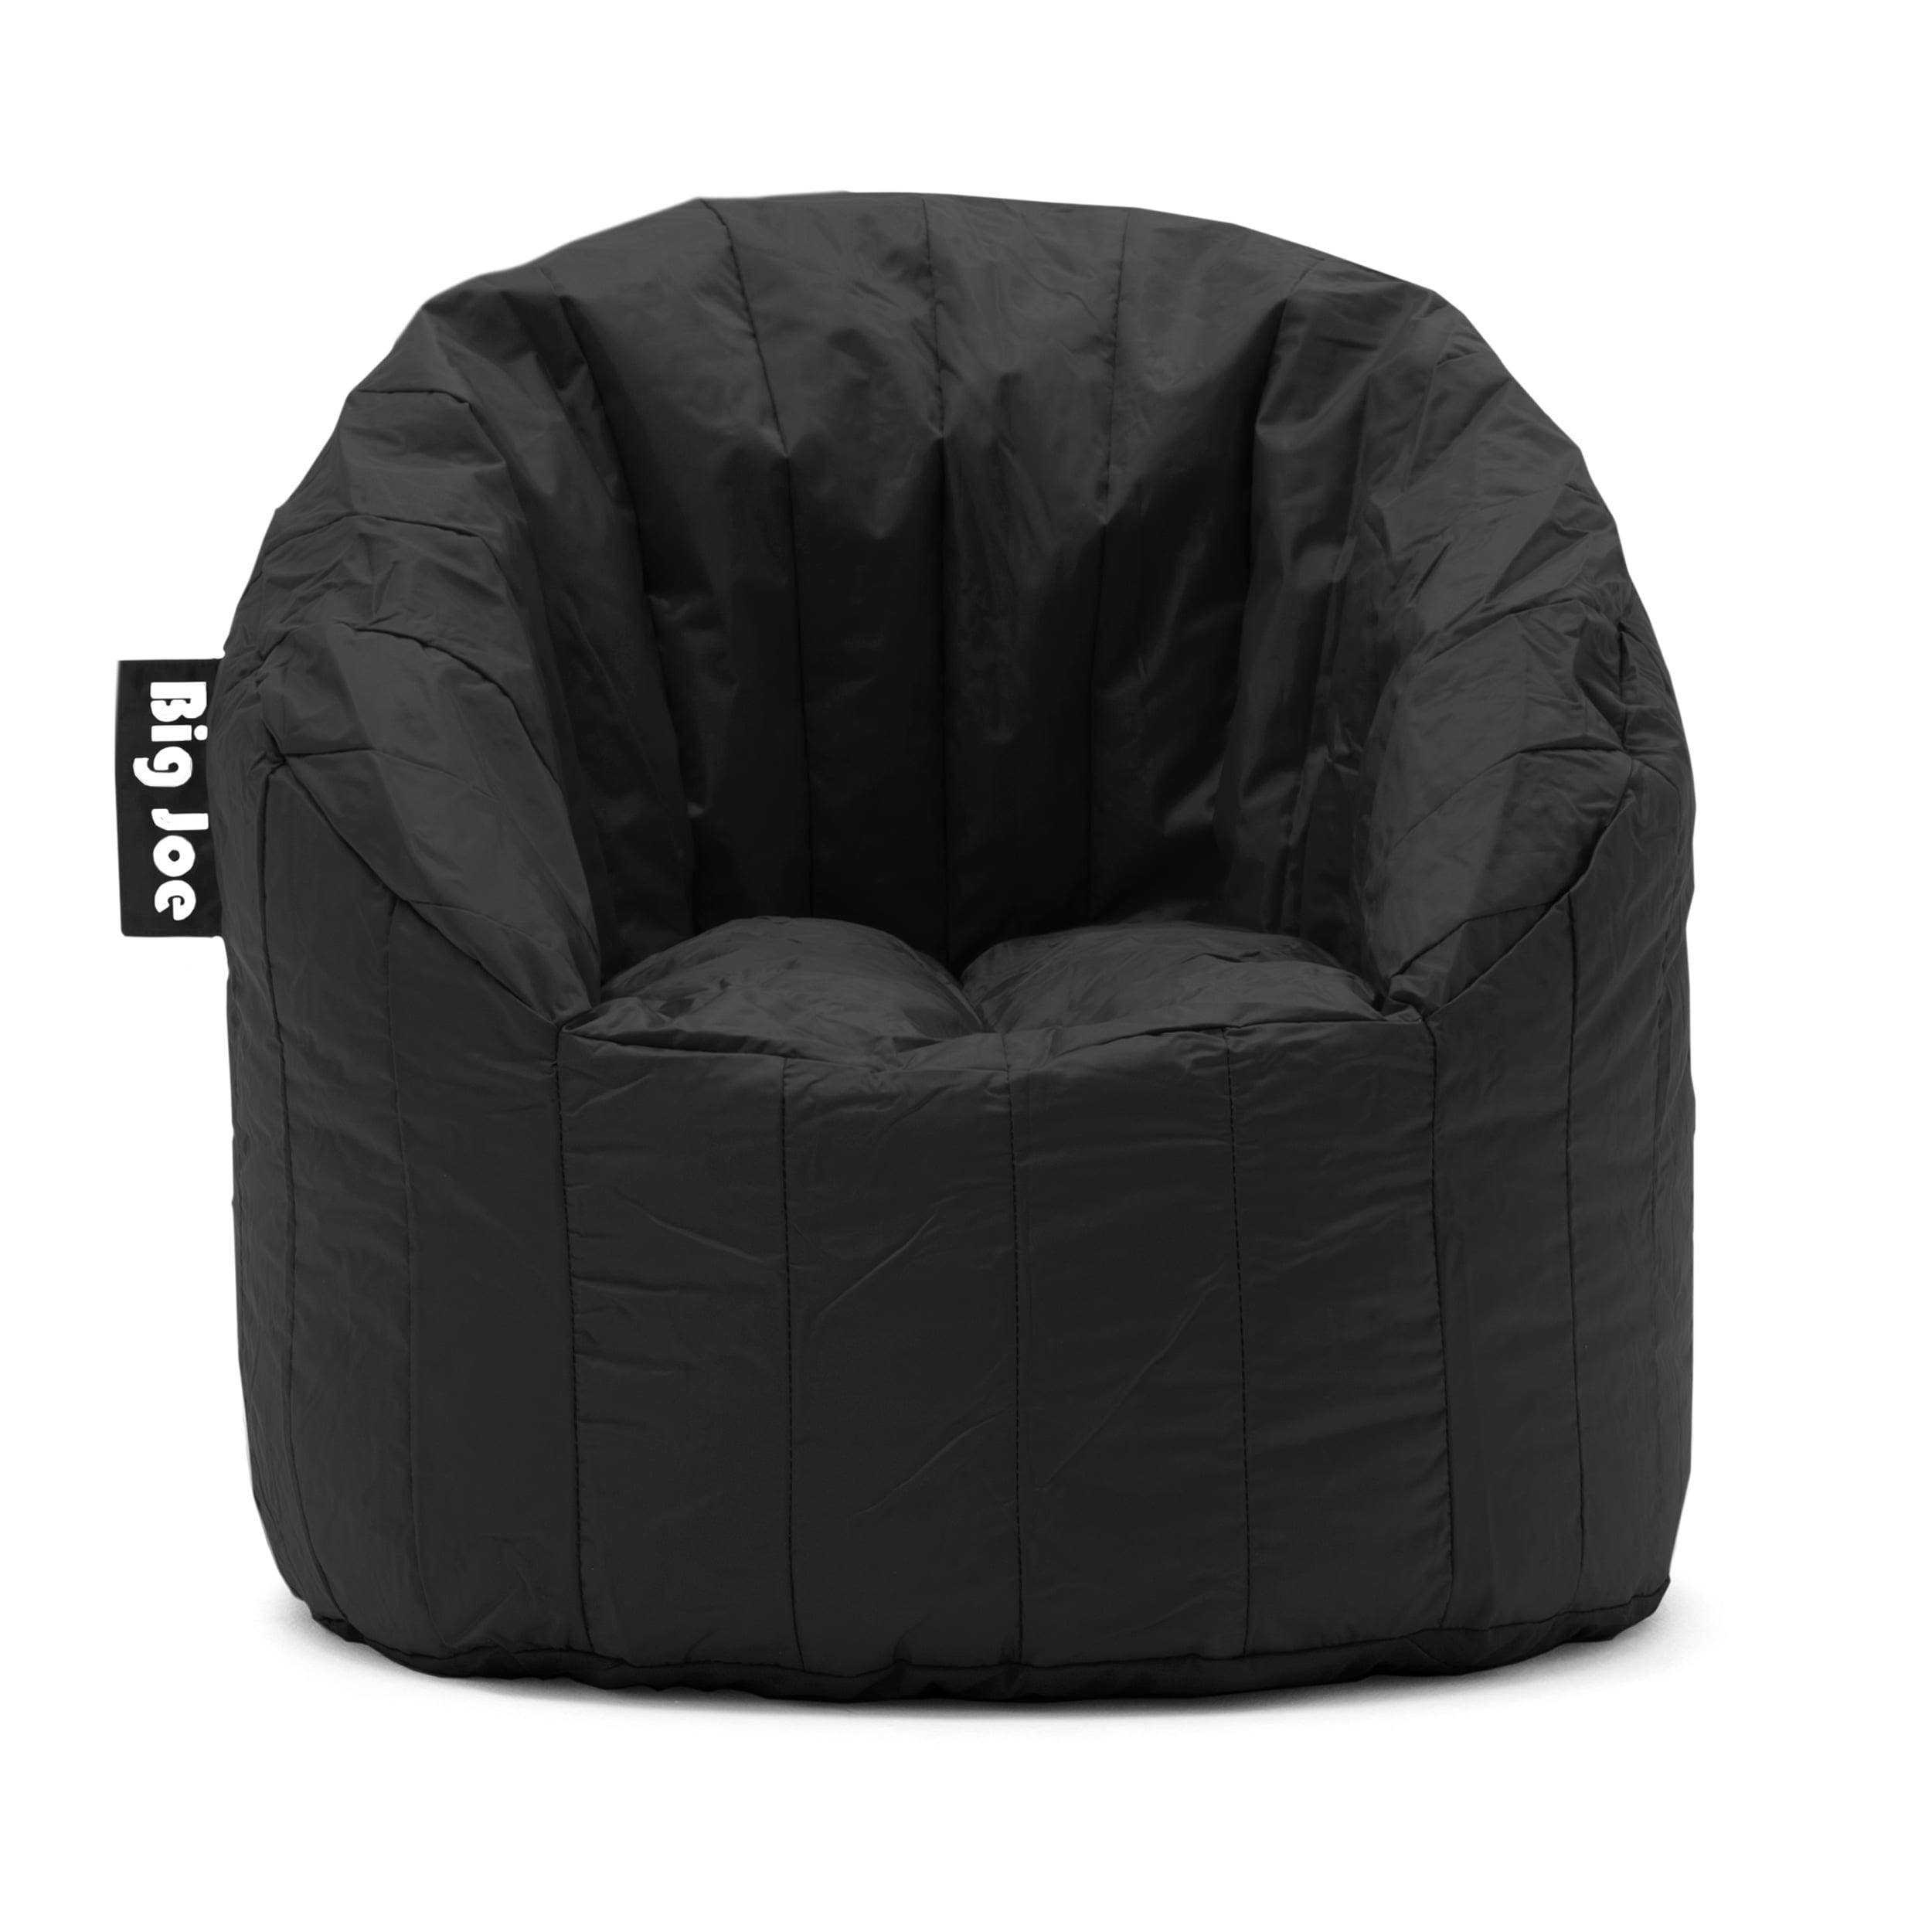 Delicieux Big Joe Lumin Bean Bag Chair, Available In Multiple Colors   Walmart.com